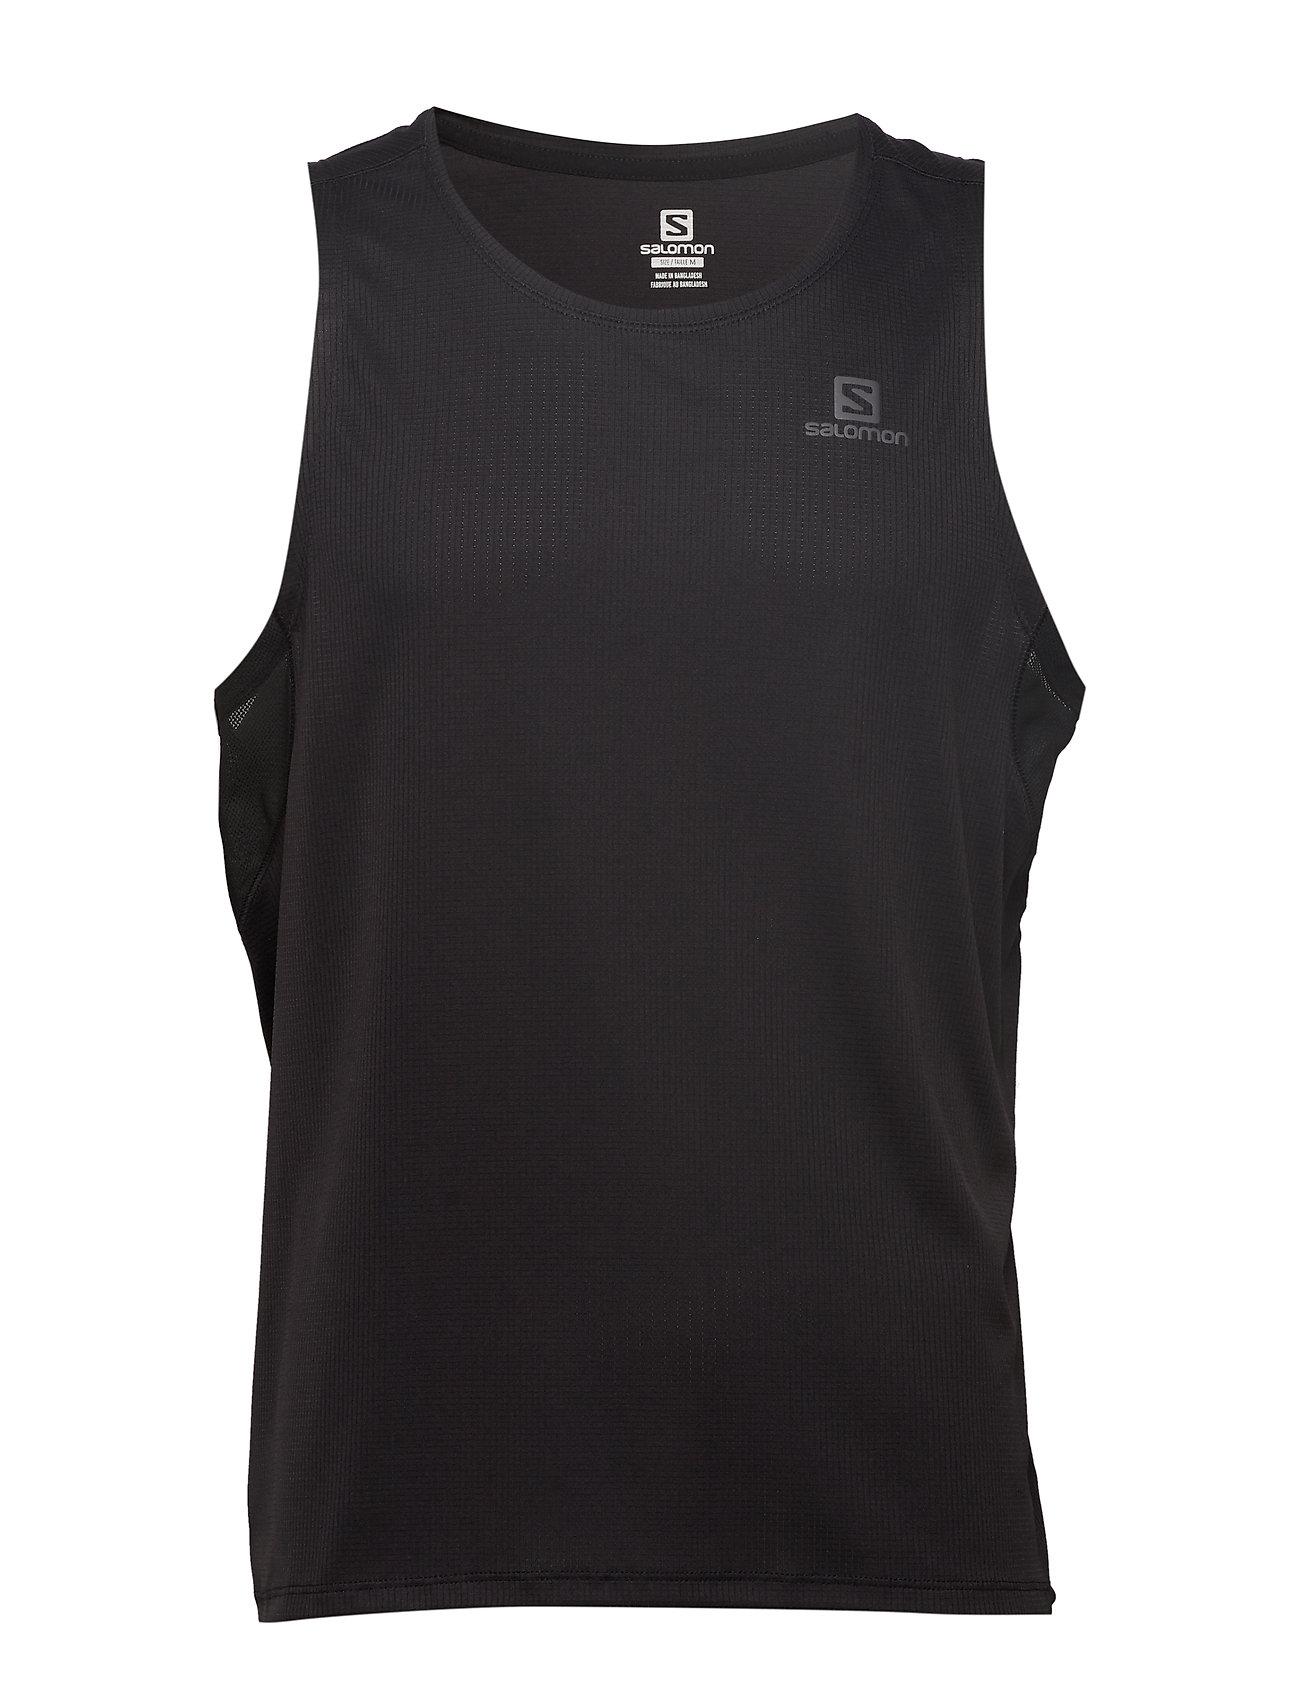 be5500f38bd Agile Tank M Black (Black) (21 €) - Salomon - | Boozt.com